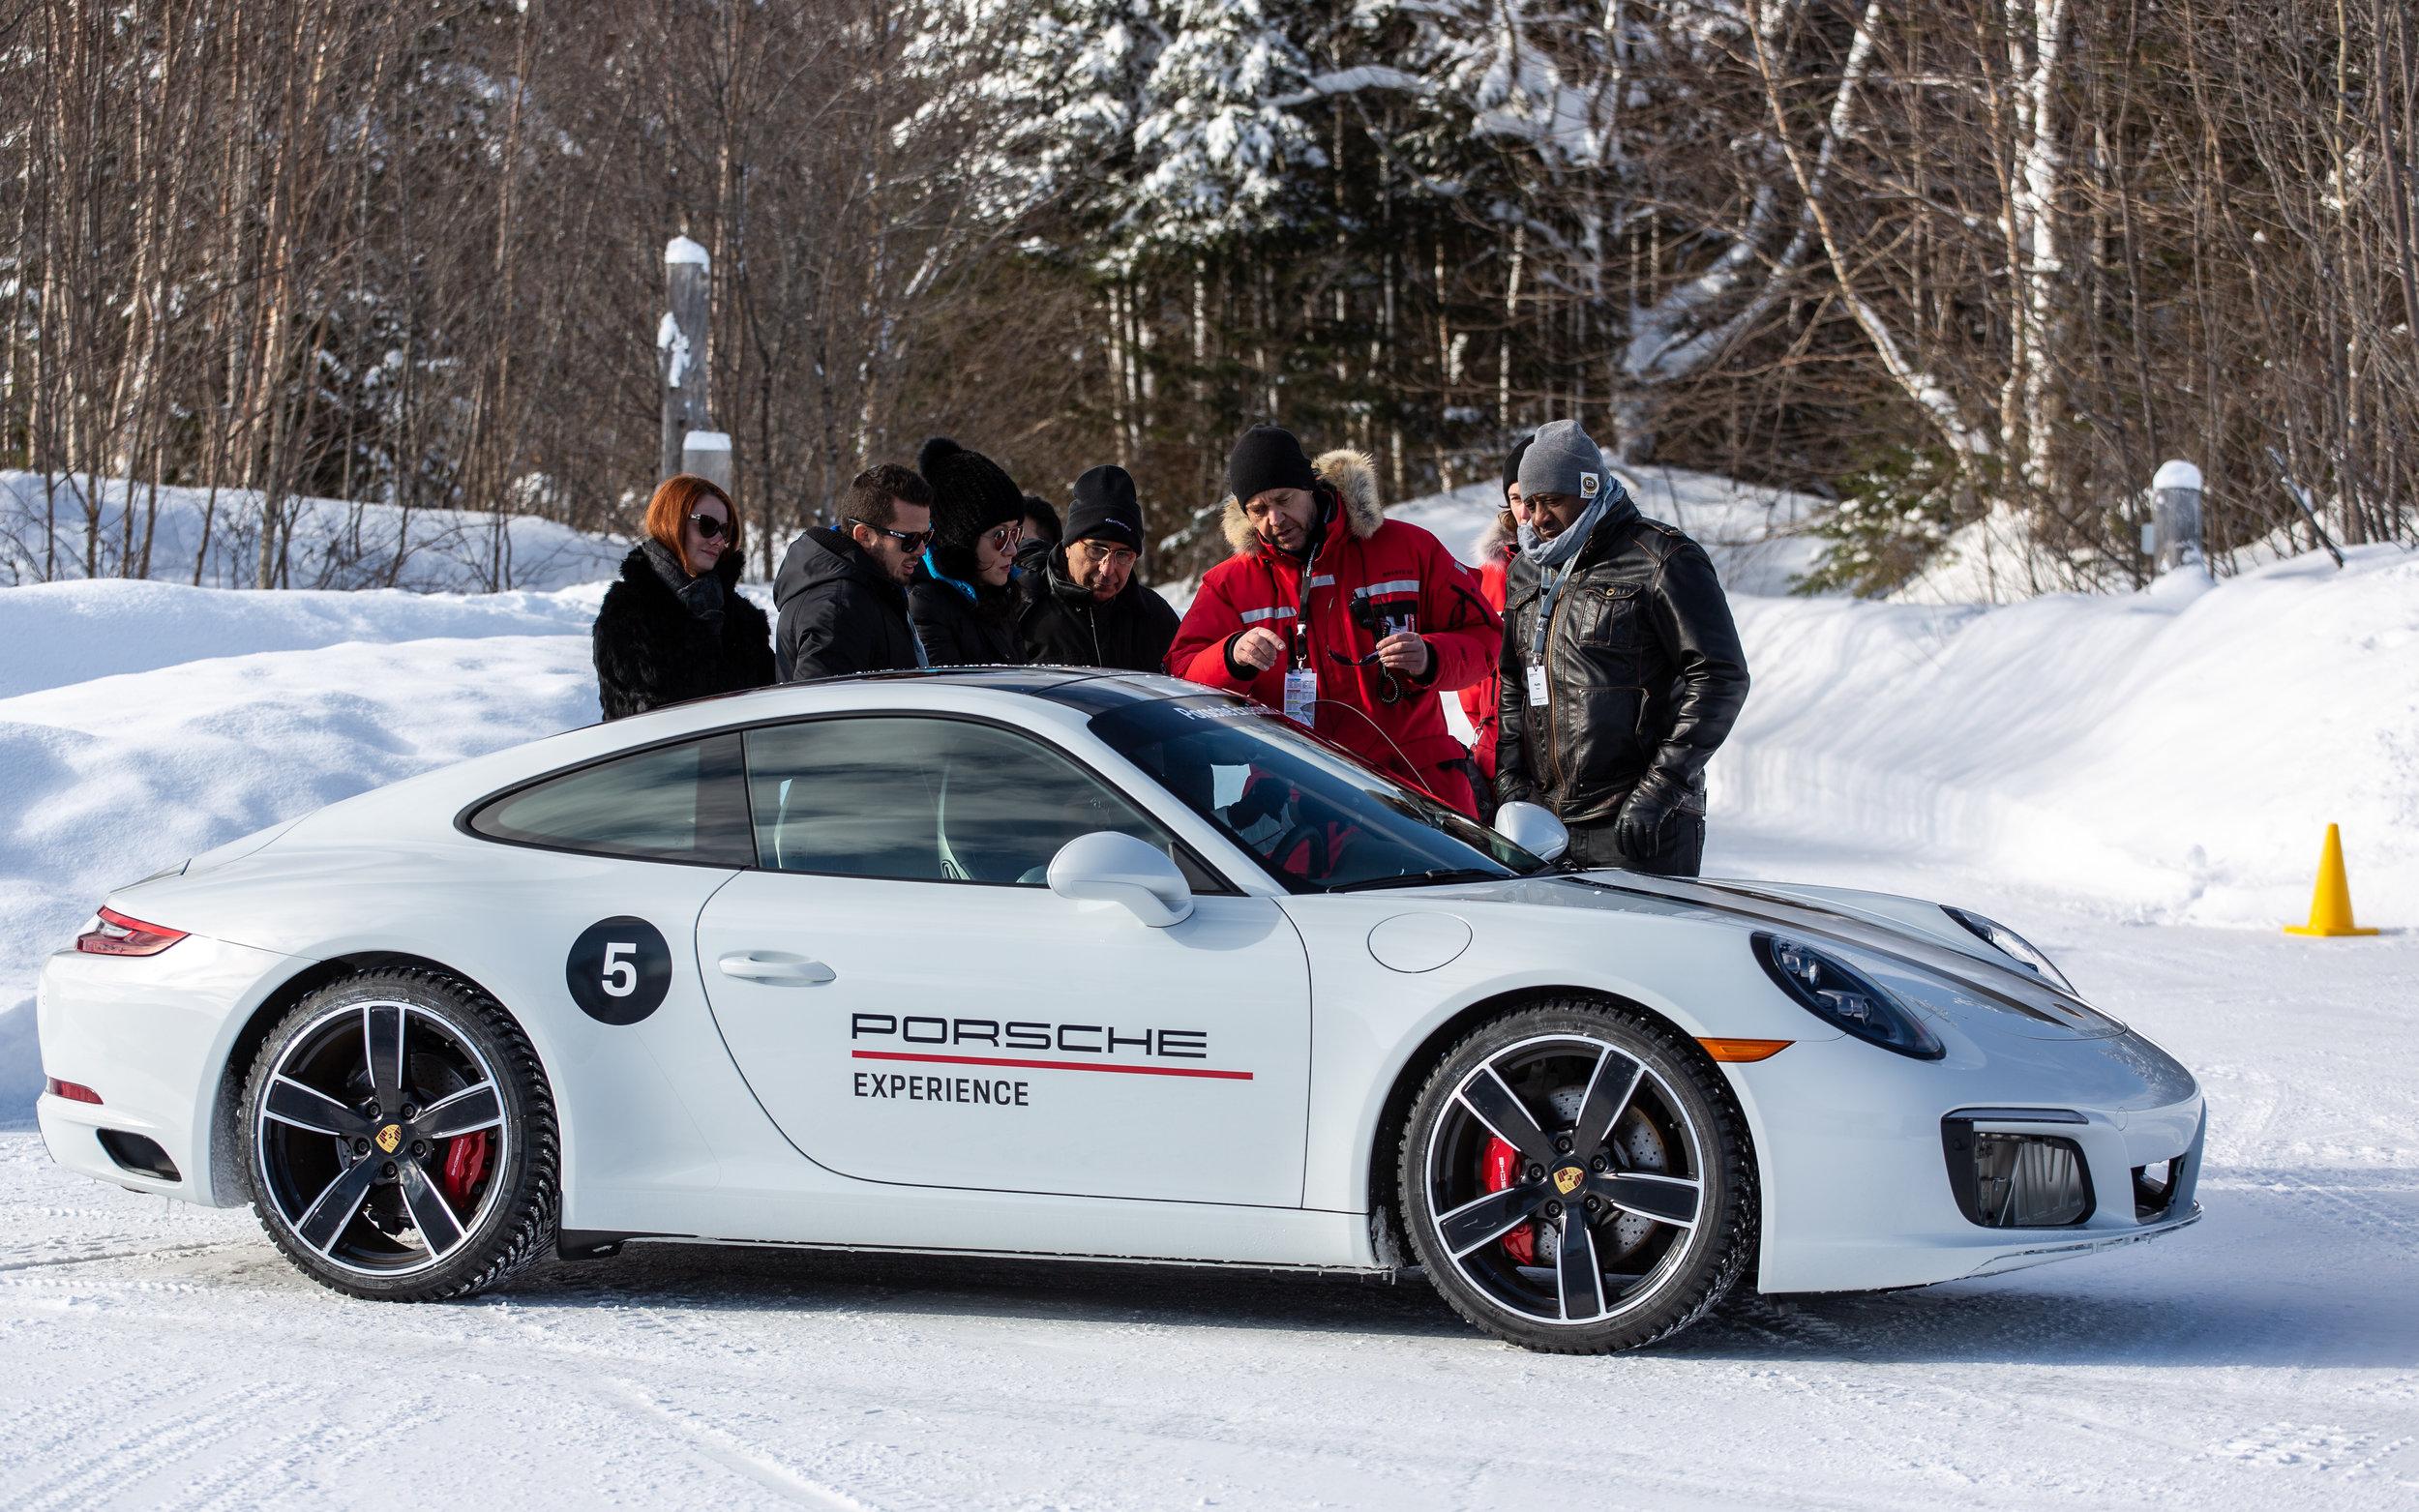 Porsche Ice Experience 2019